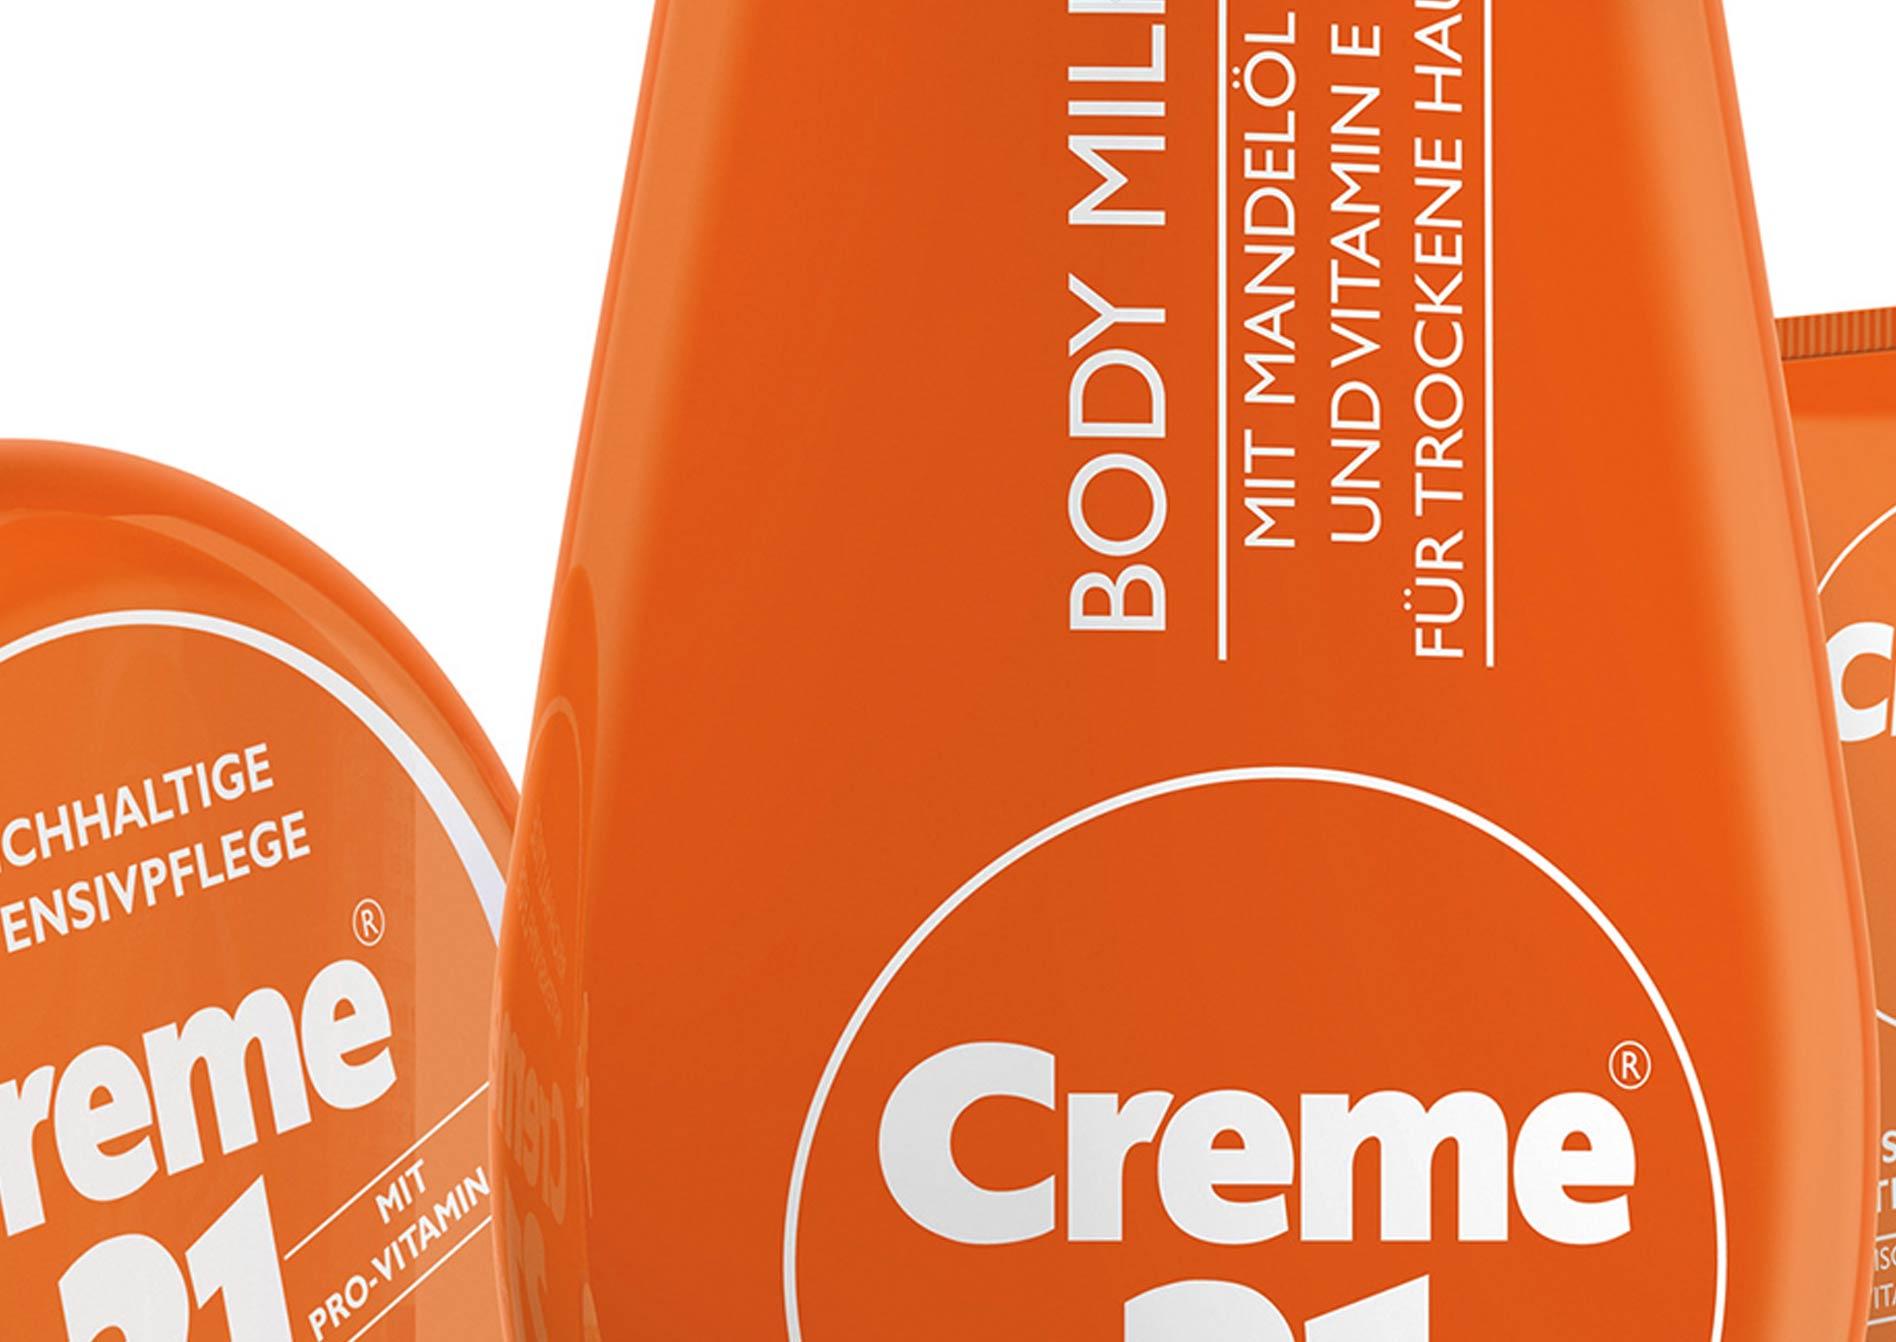 Creme 21 Classic Range